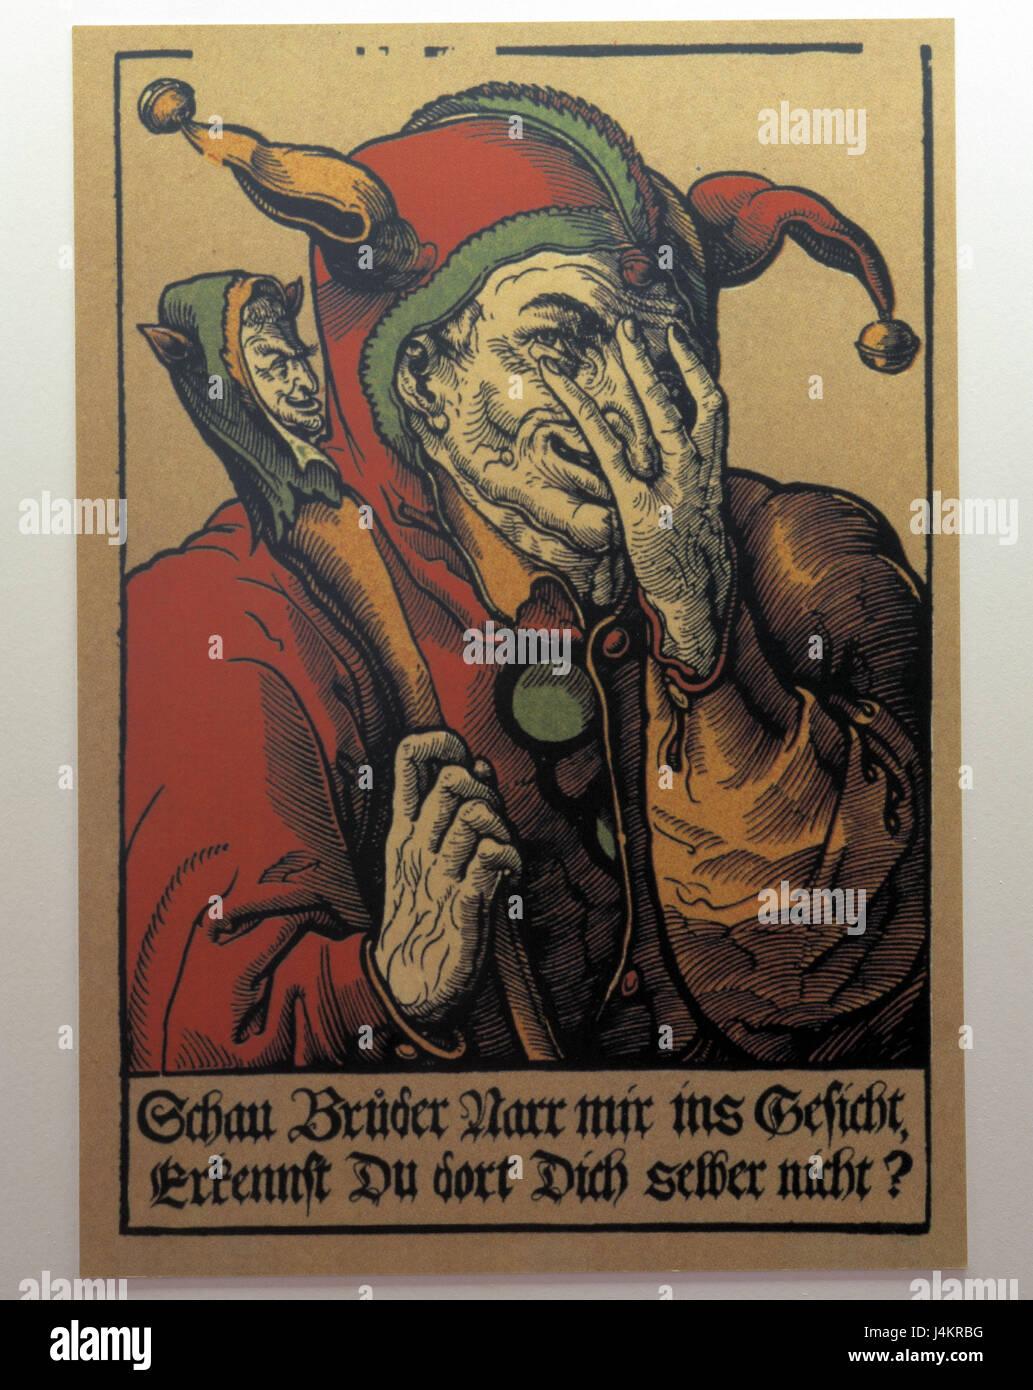 Museum, poster, Till Eulenspiegel Europa, Germany, Lower Saxony, nature reserve Elm-Lappwald, Schöppenstedt, - Stock Image